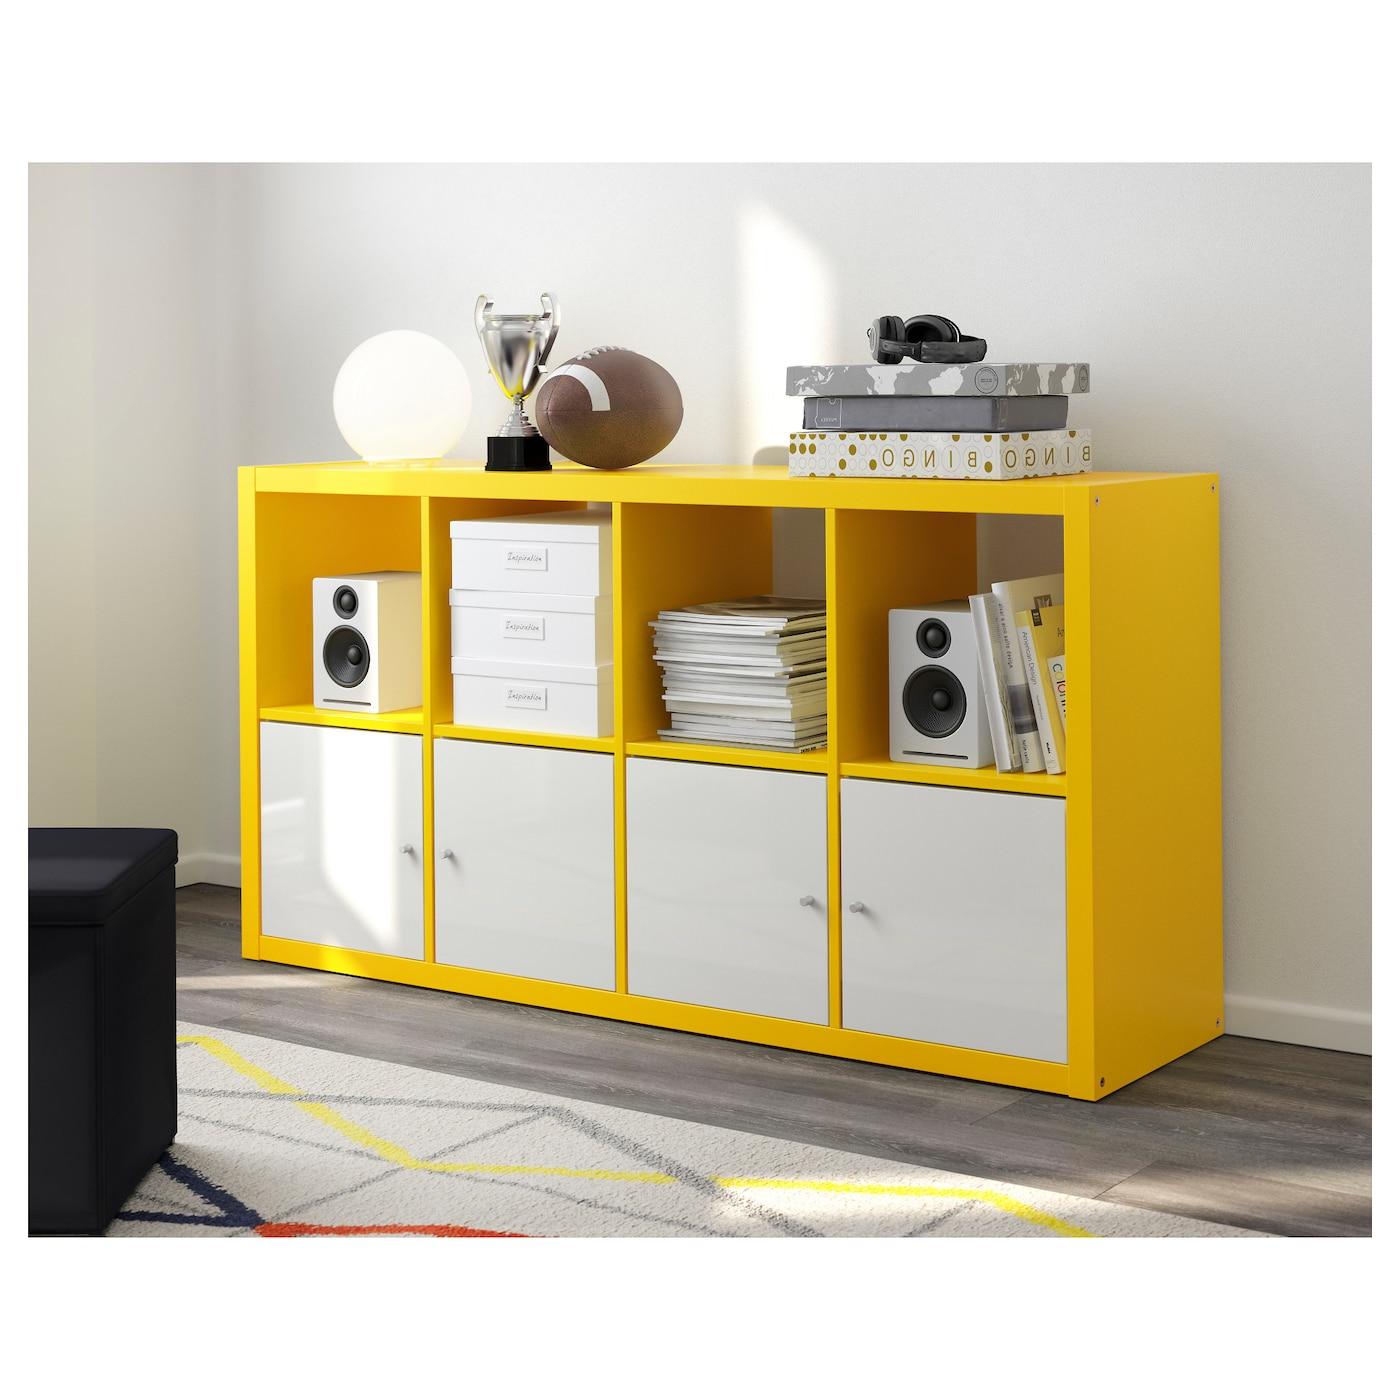 kallax shelving unit yellow 77 x 147 cm ikea. Black Bedroom Furniture Sets. Home Design Ideas